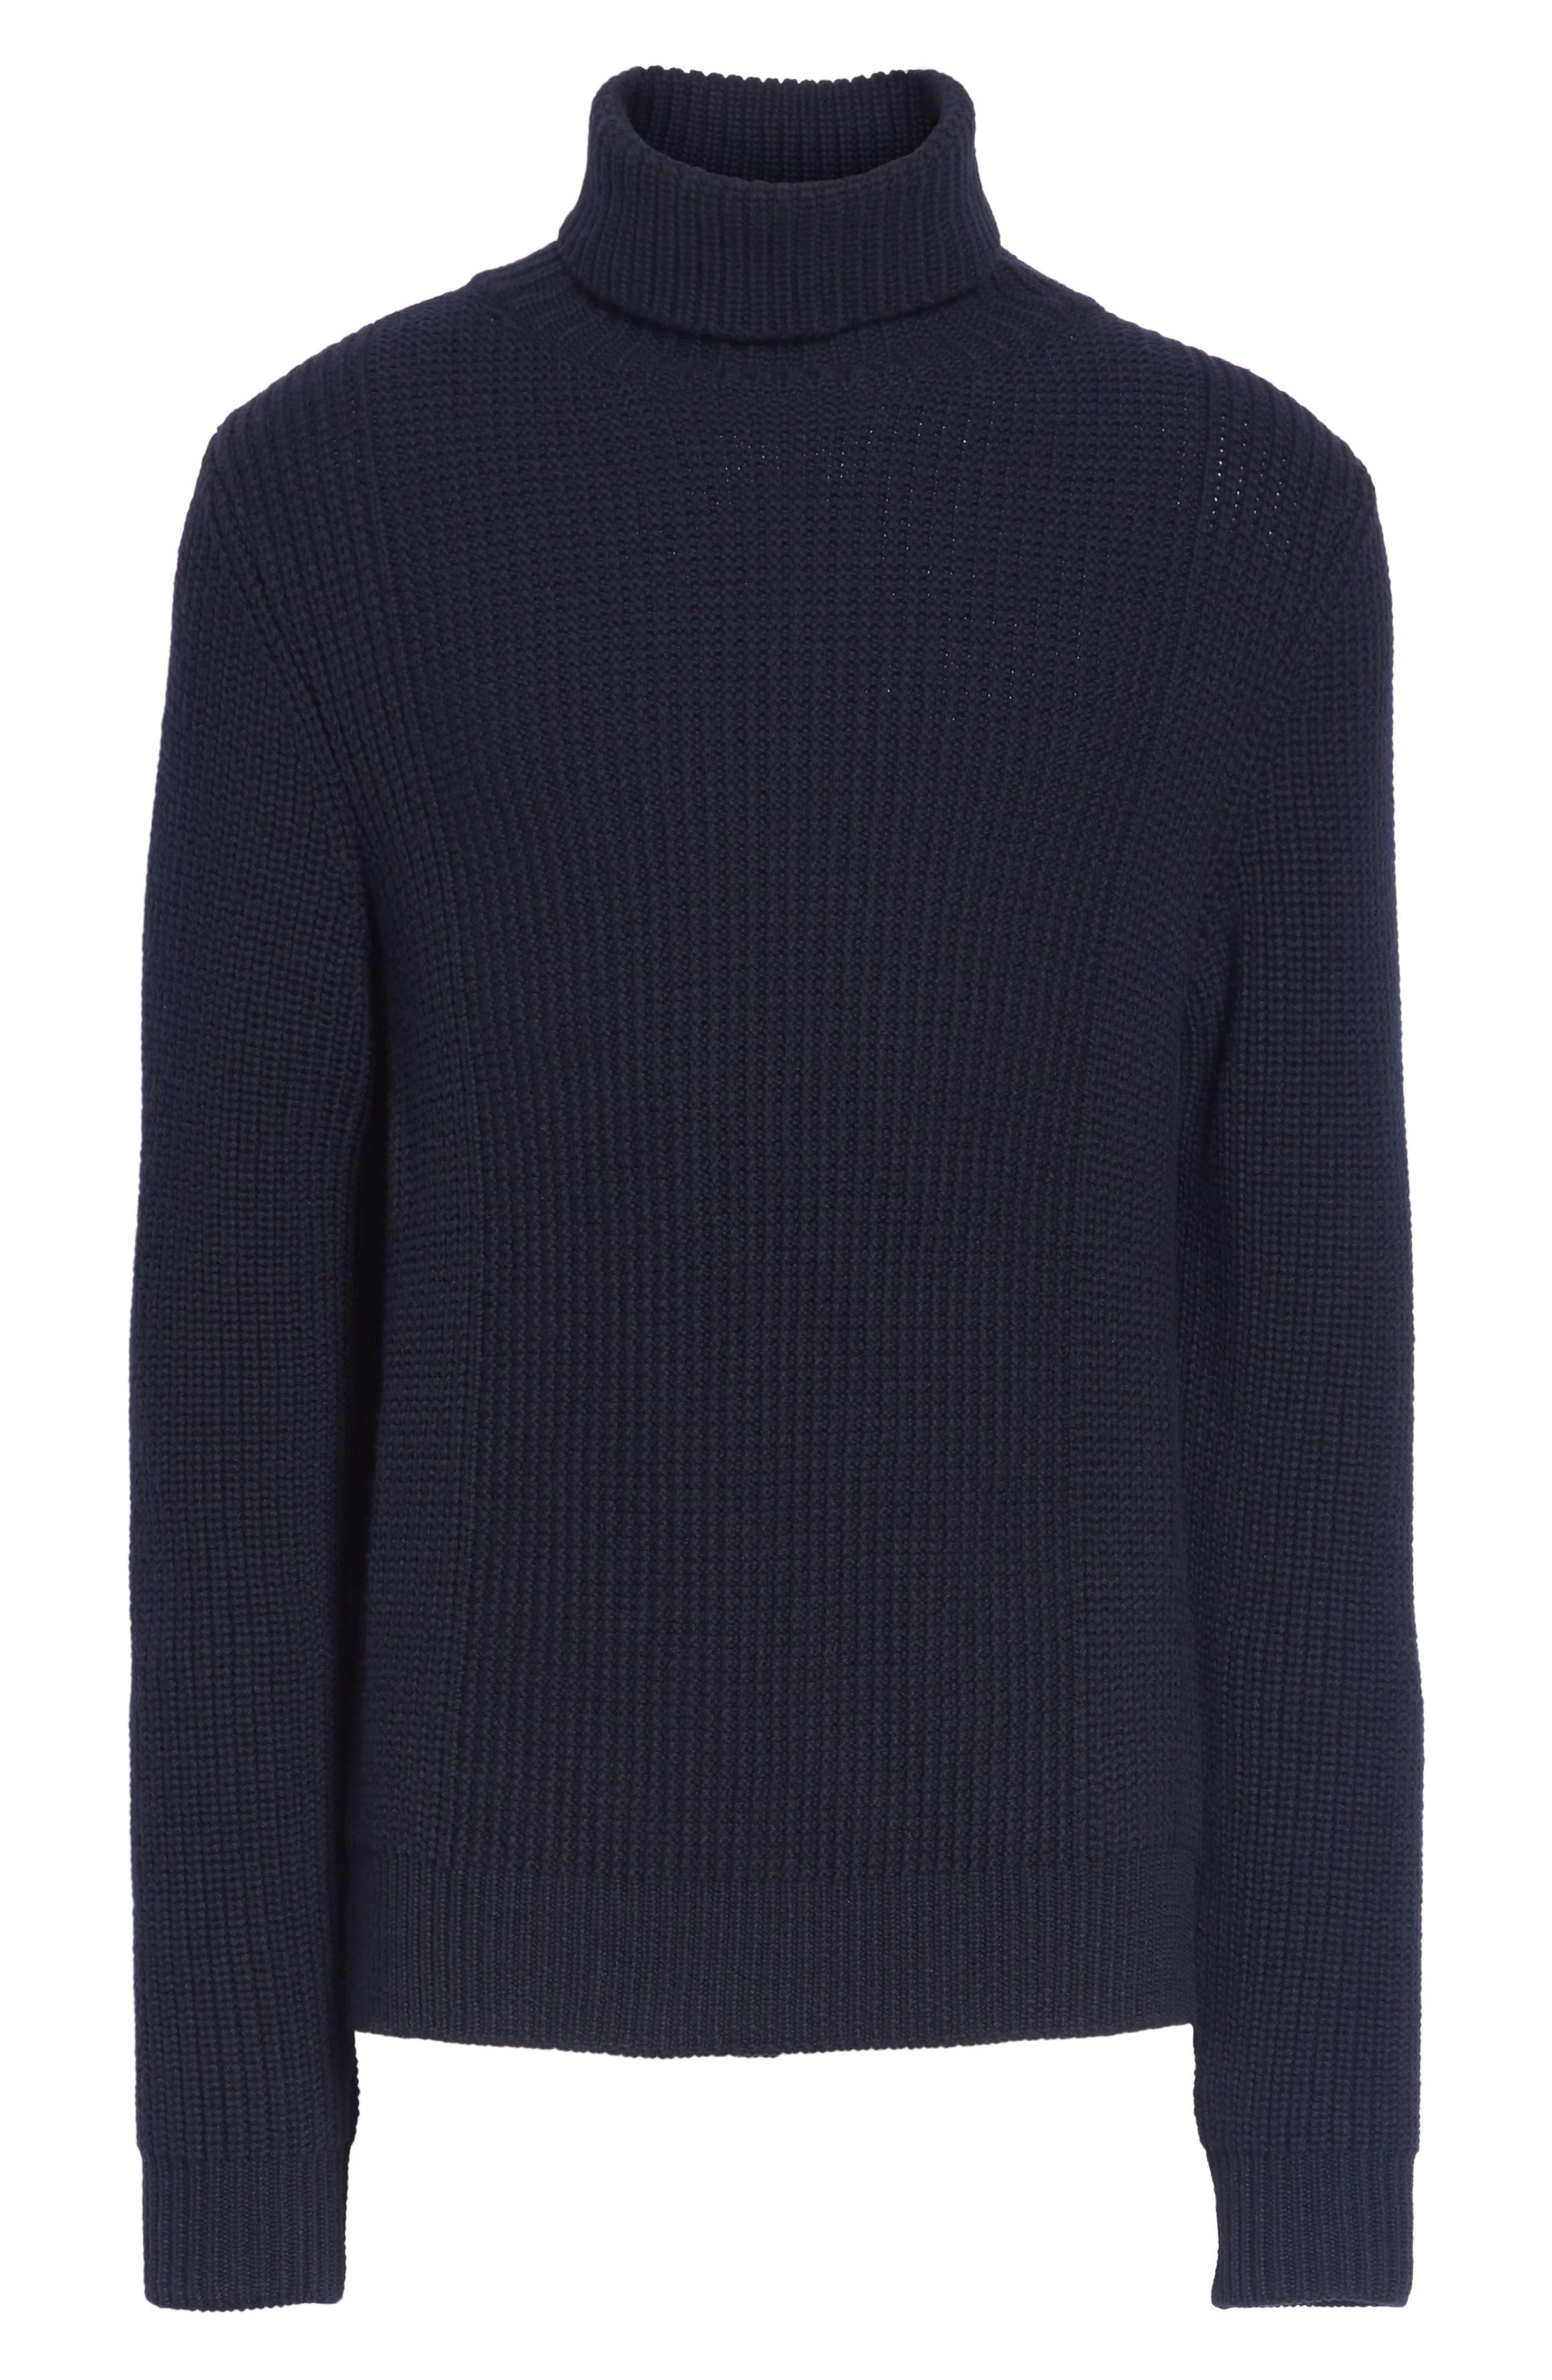 Ribbed Merino Wool Turtleneck Sweater,                             Alternate thumbnail 6, color,                             NAVY